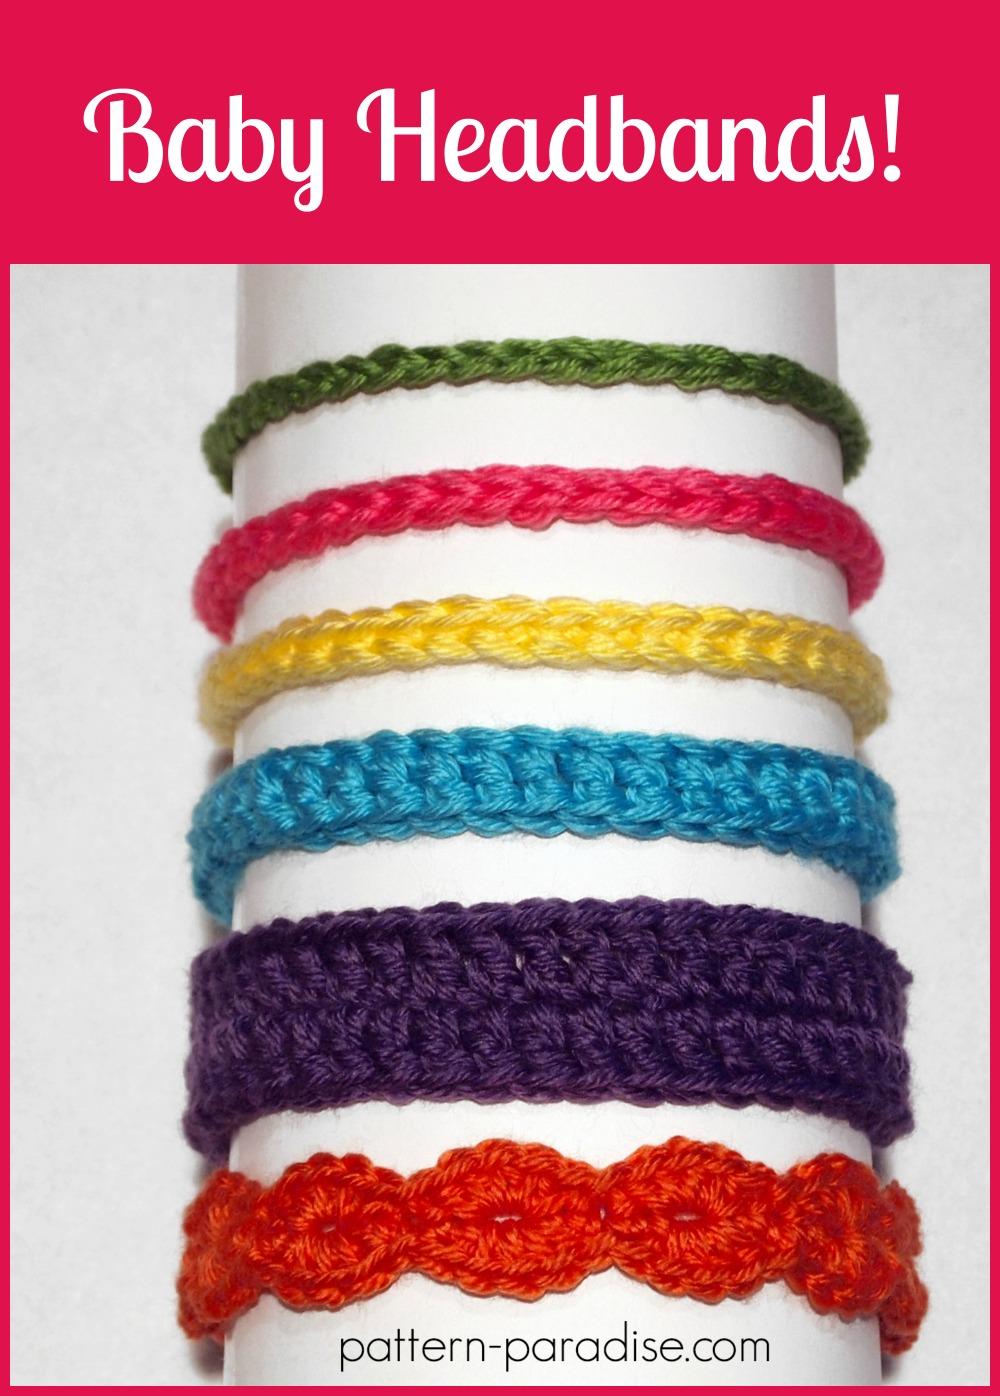 Free Crochet Pattern Six Styles of Baby Headbands